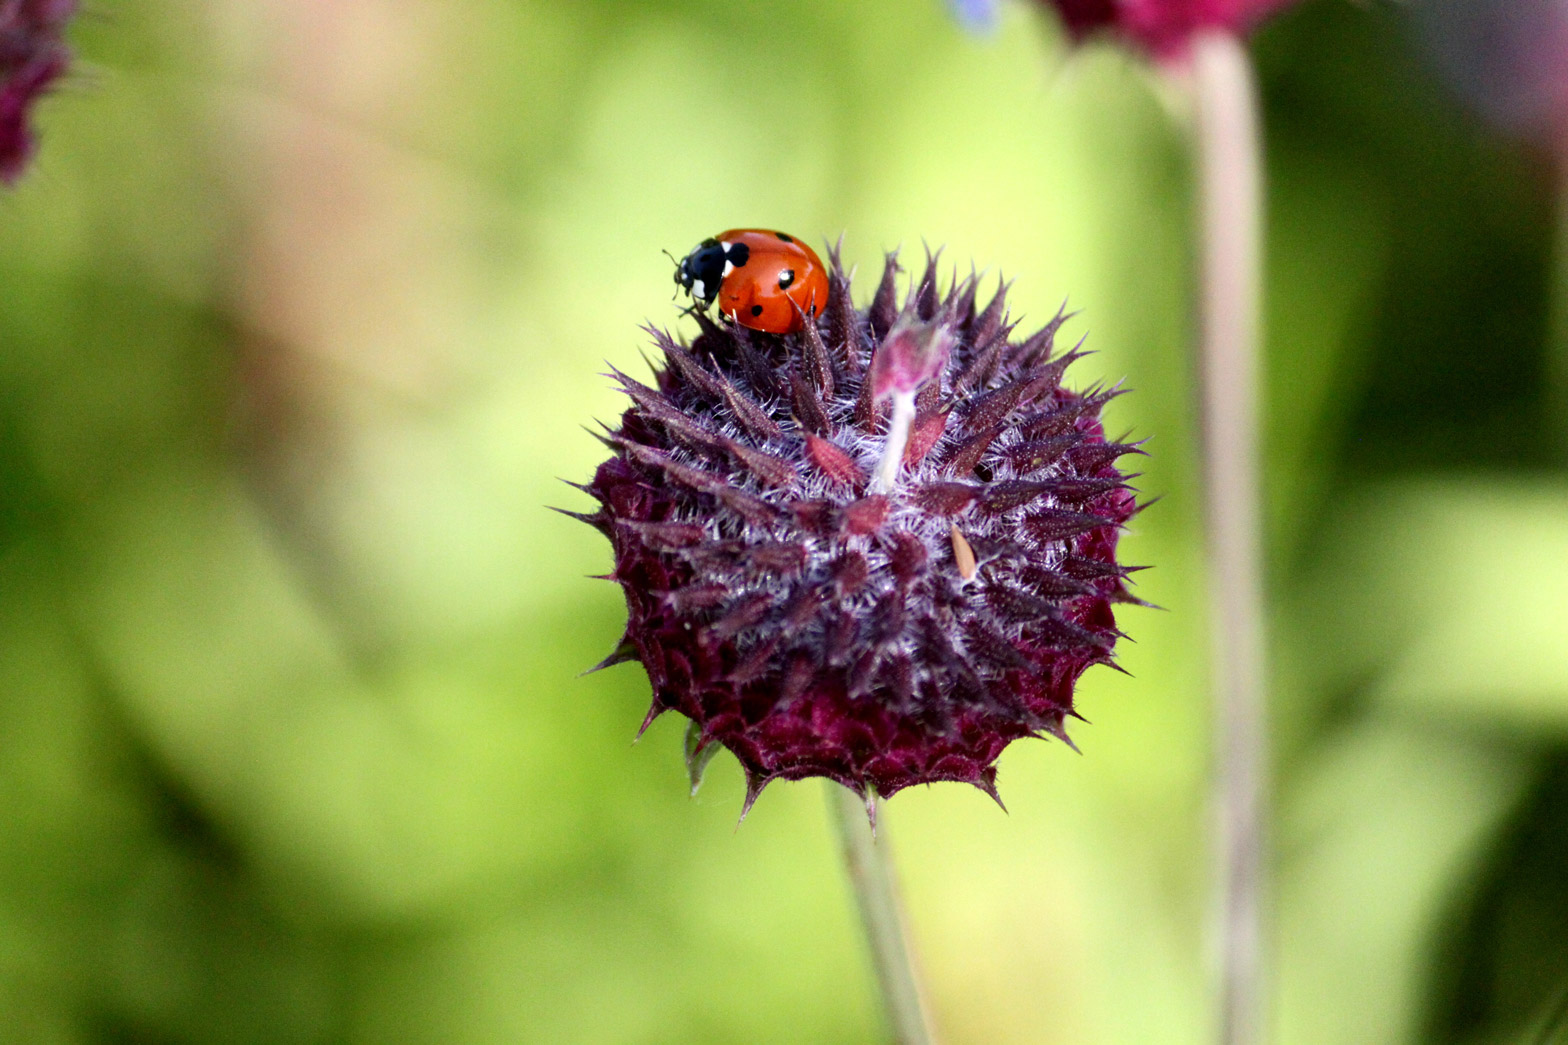 A Ladybug sits atop a purple Chia flower.